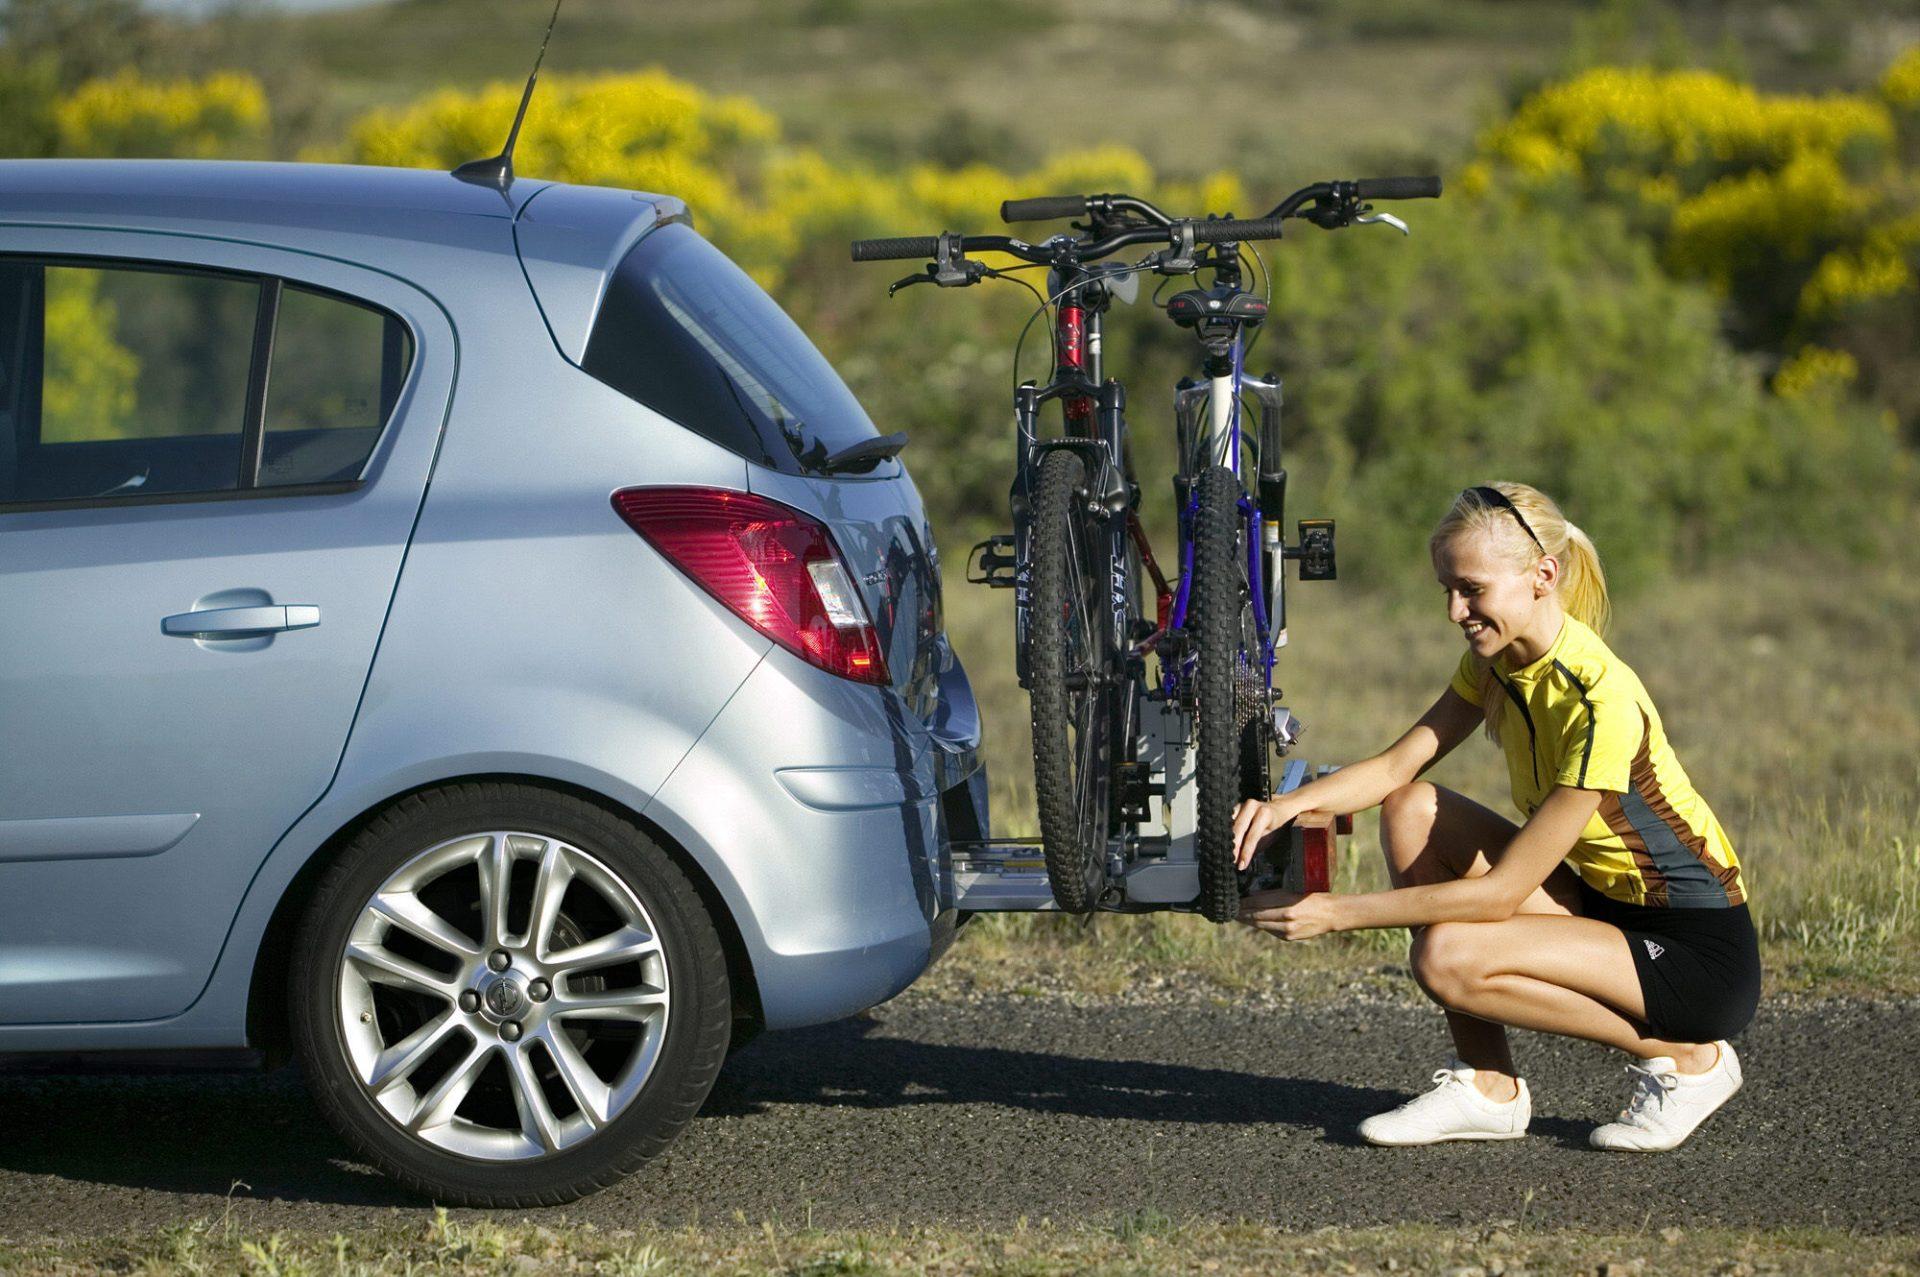 Autourlaub: Wenn das Fahrrad mit soll